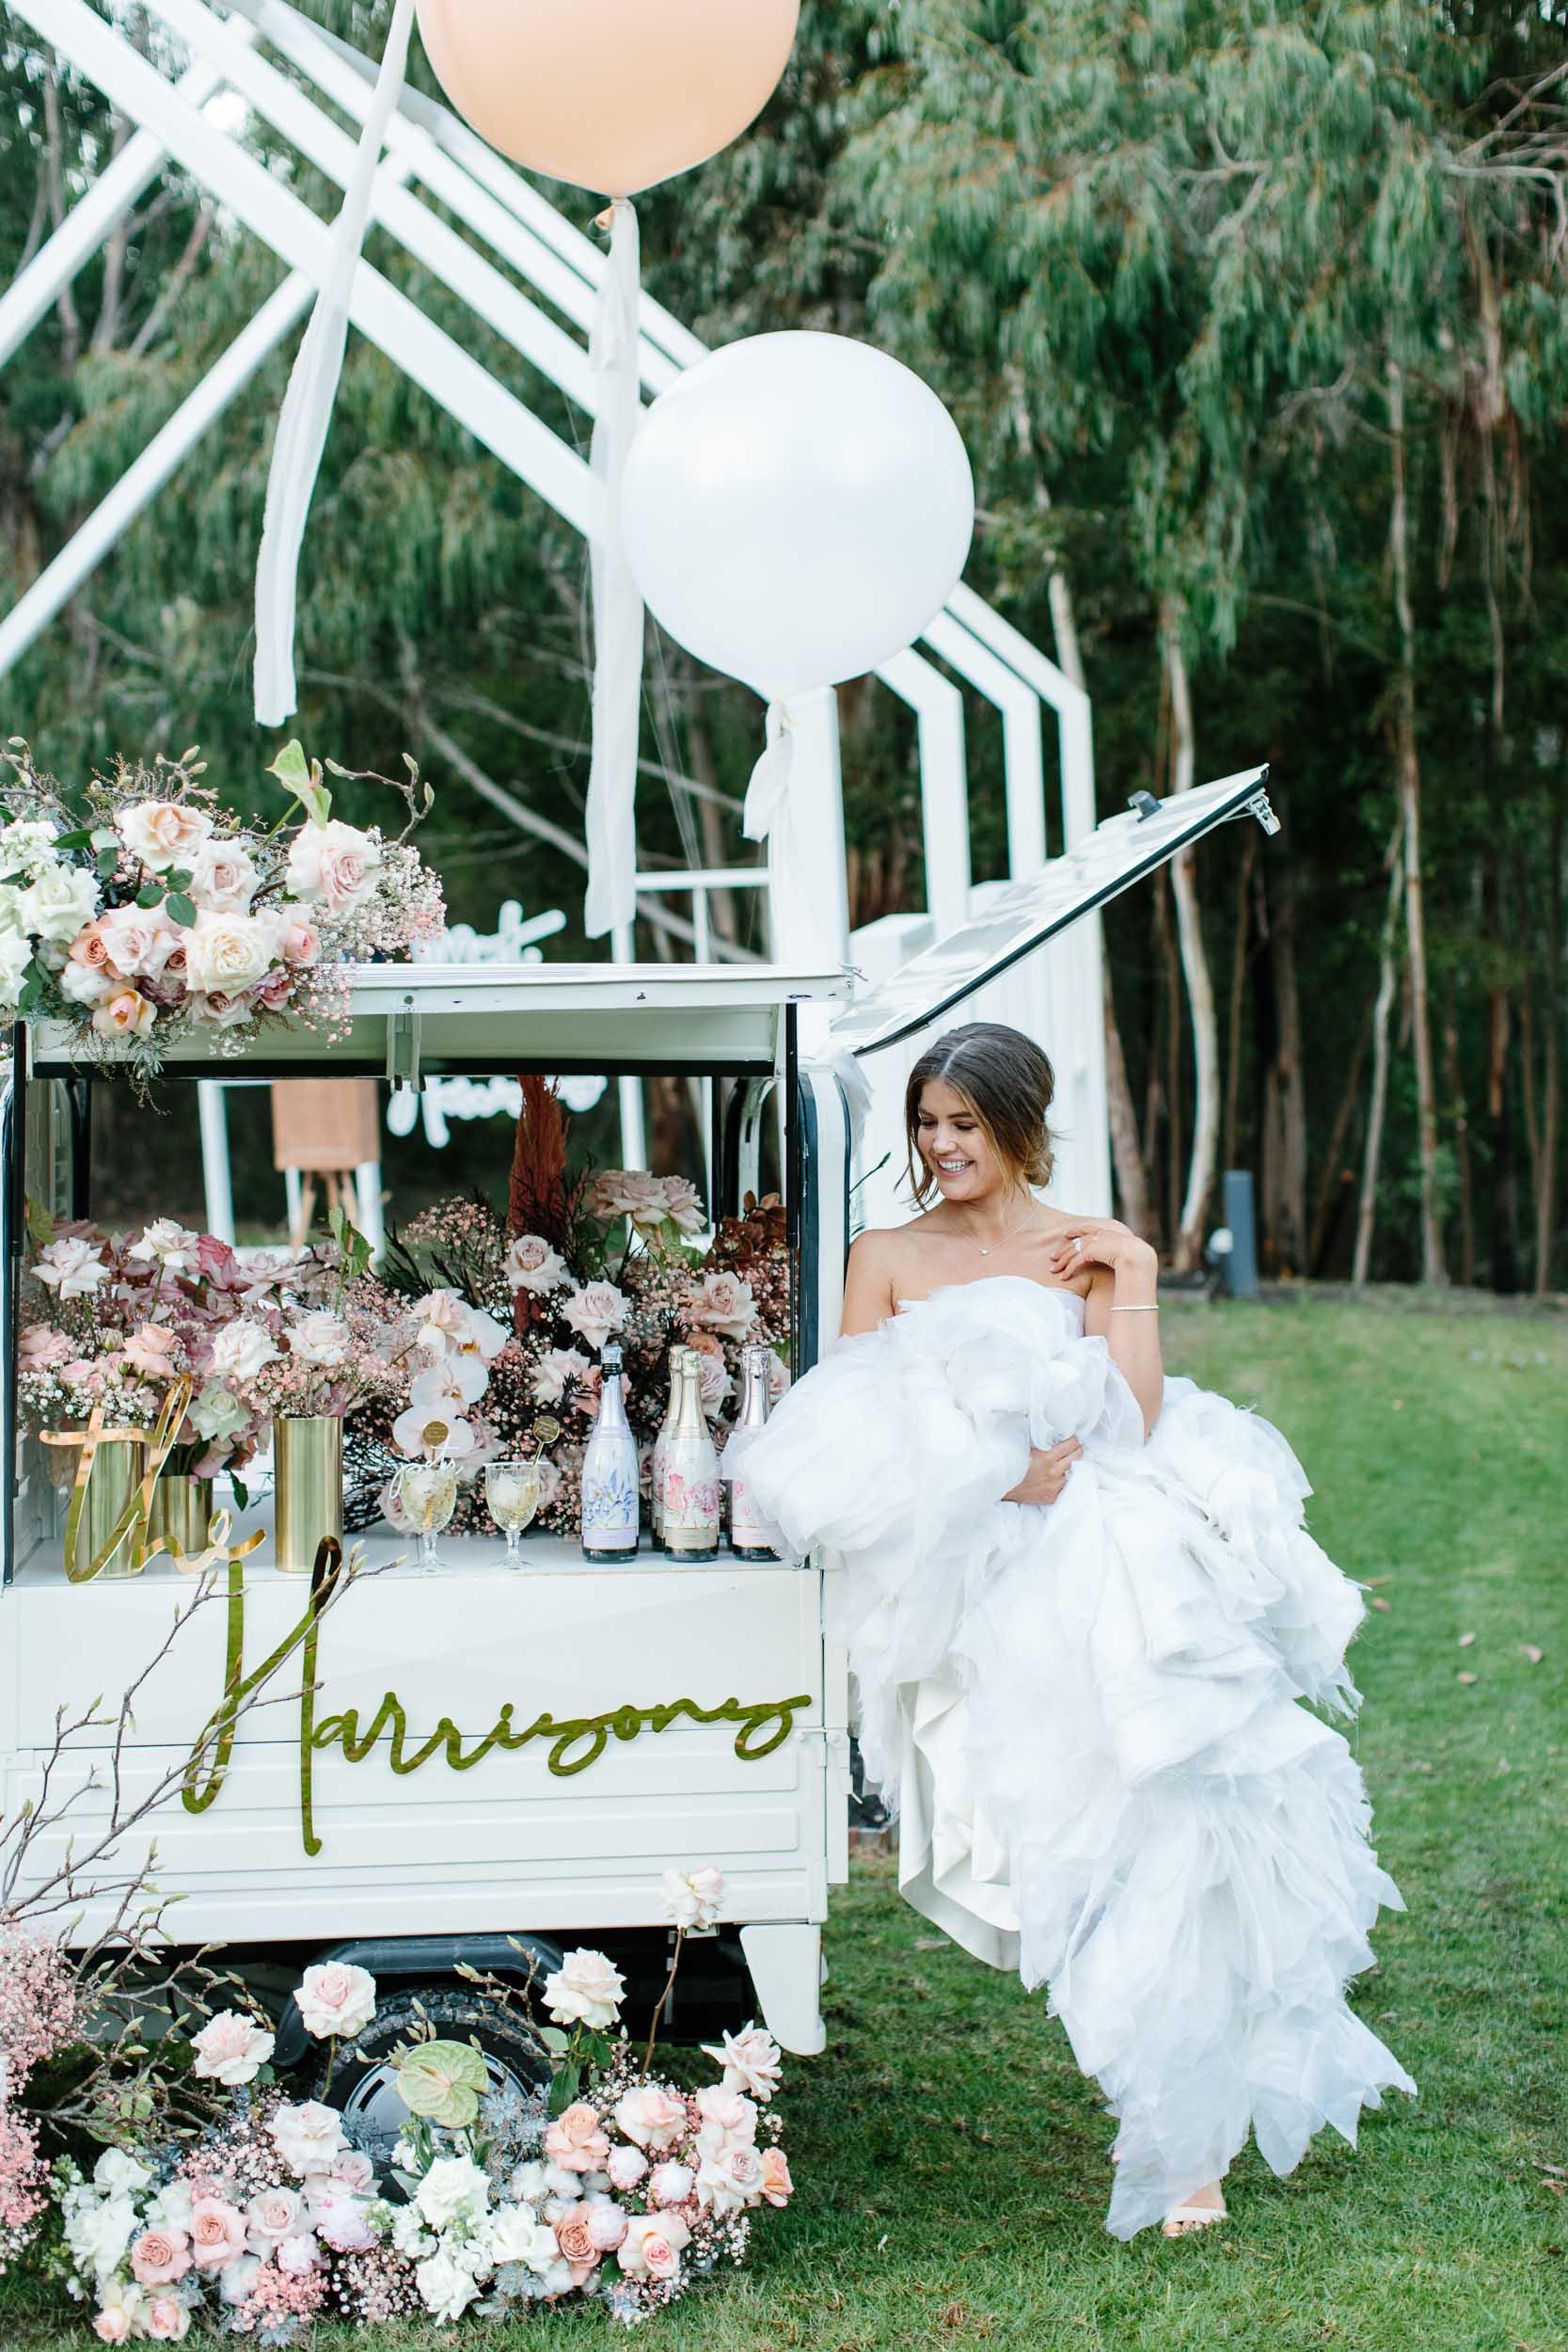 Kas-Richards-LENZO-Yarra-Valley-Wedding-One-Day-Bridal-422.jpg